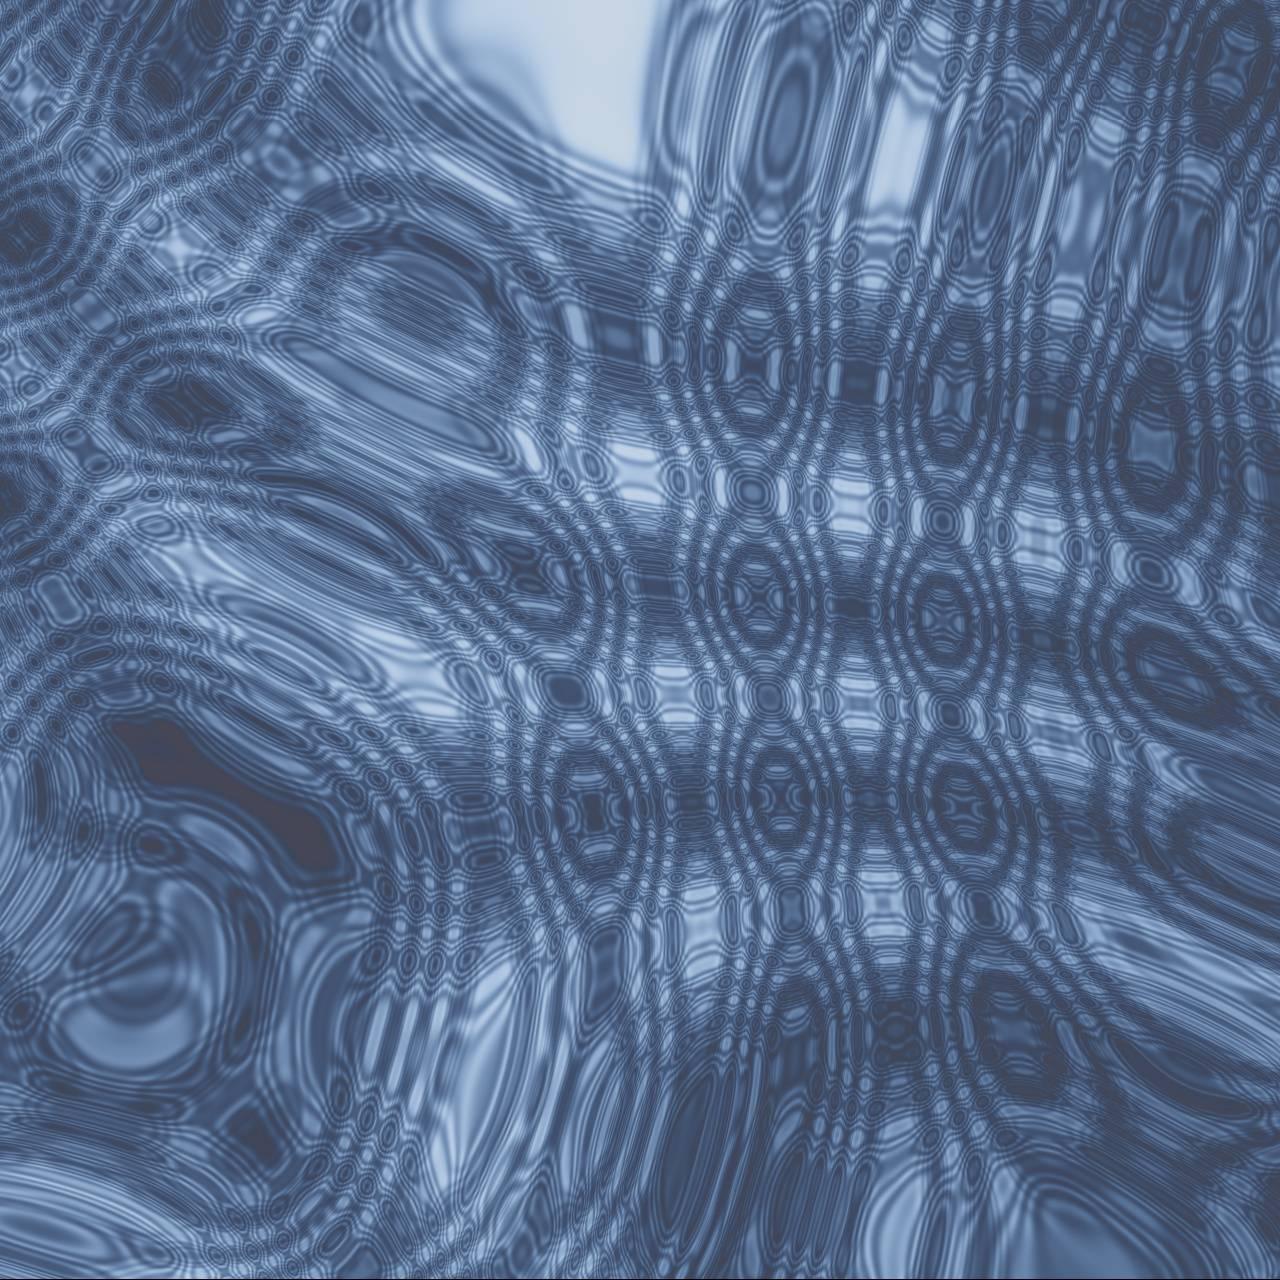 Wavelets